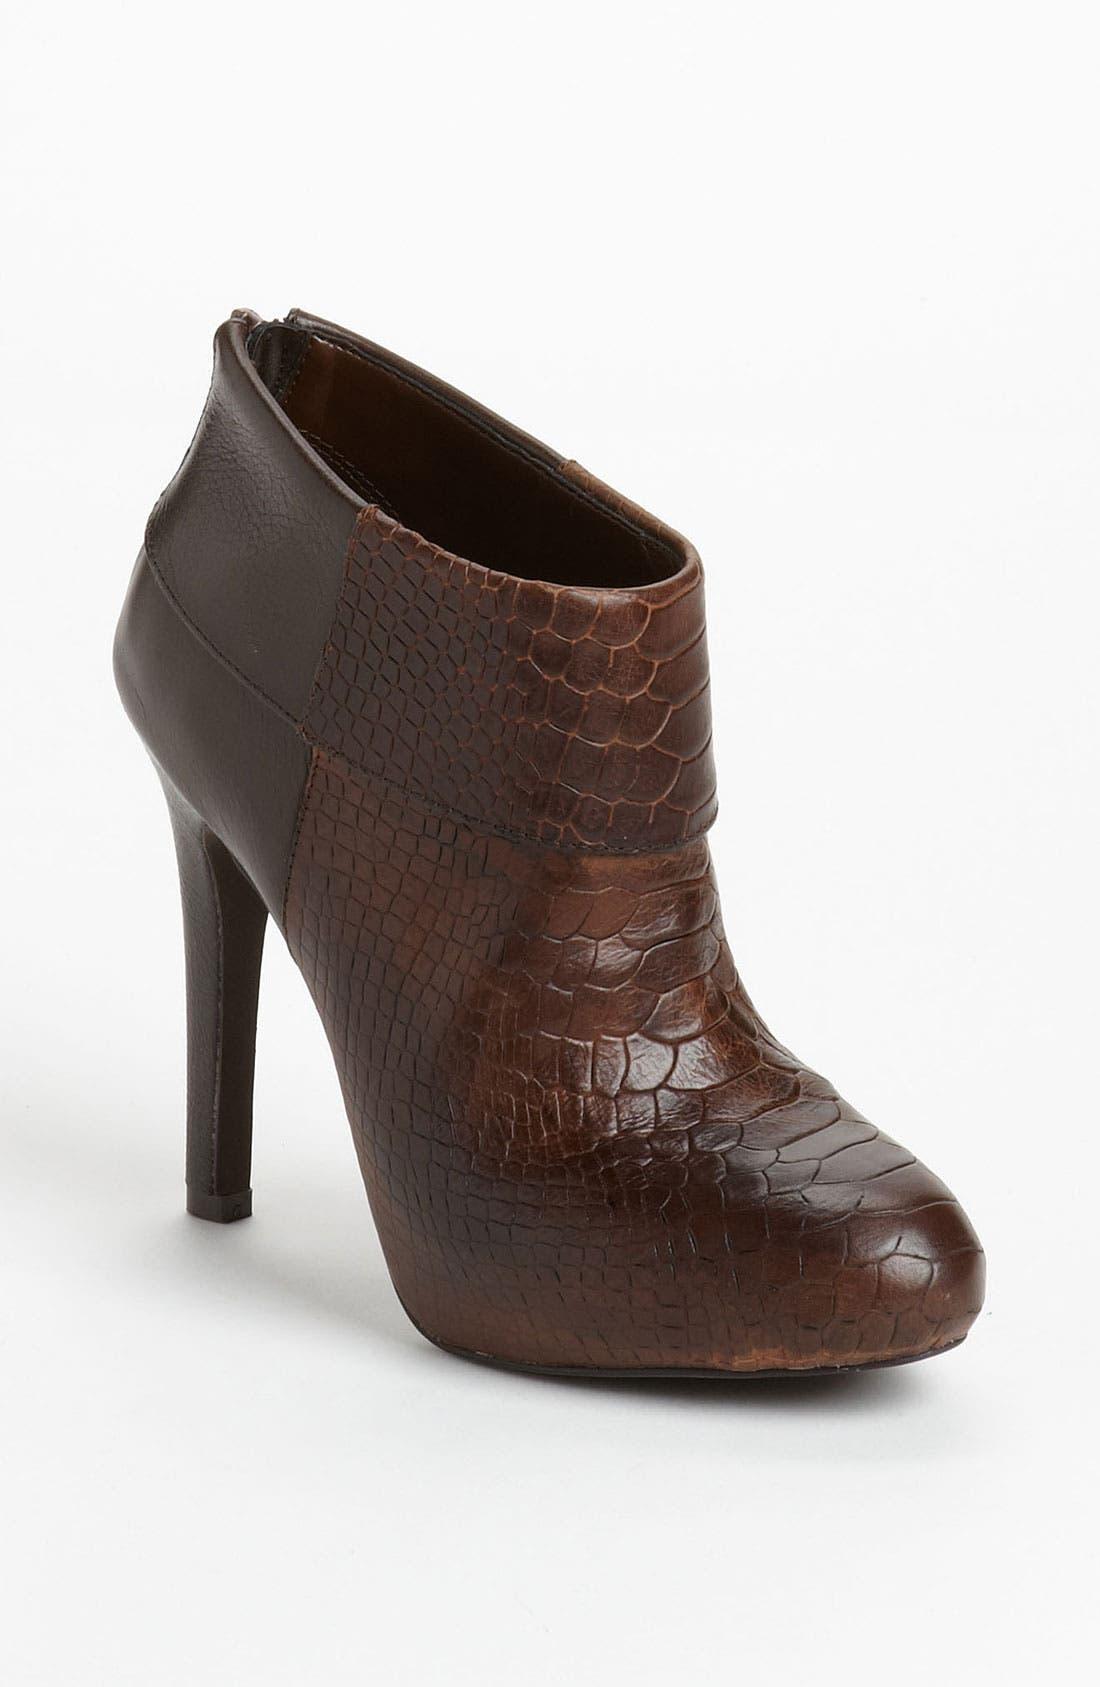 Alternate Image 1 Selected - Jessica Simpson 'Audriana' Boot